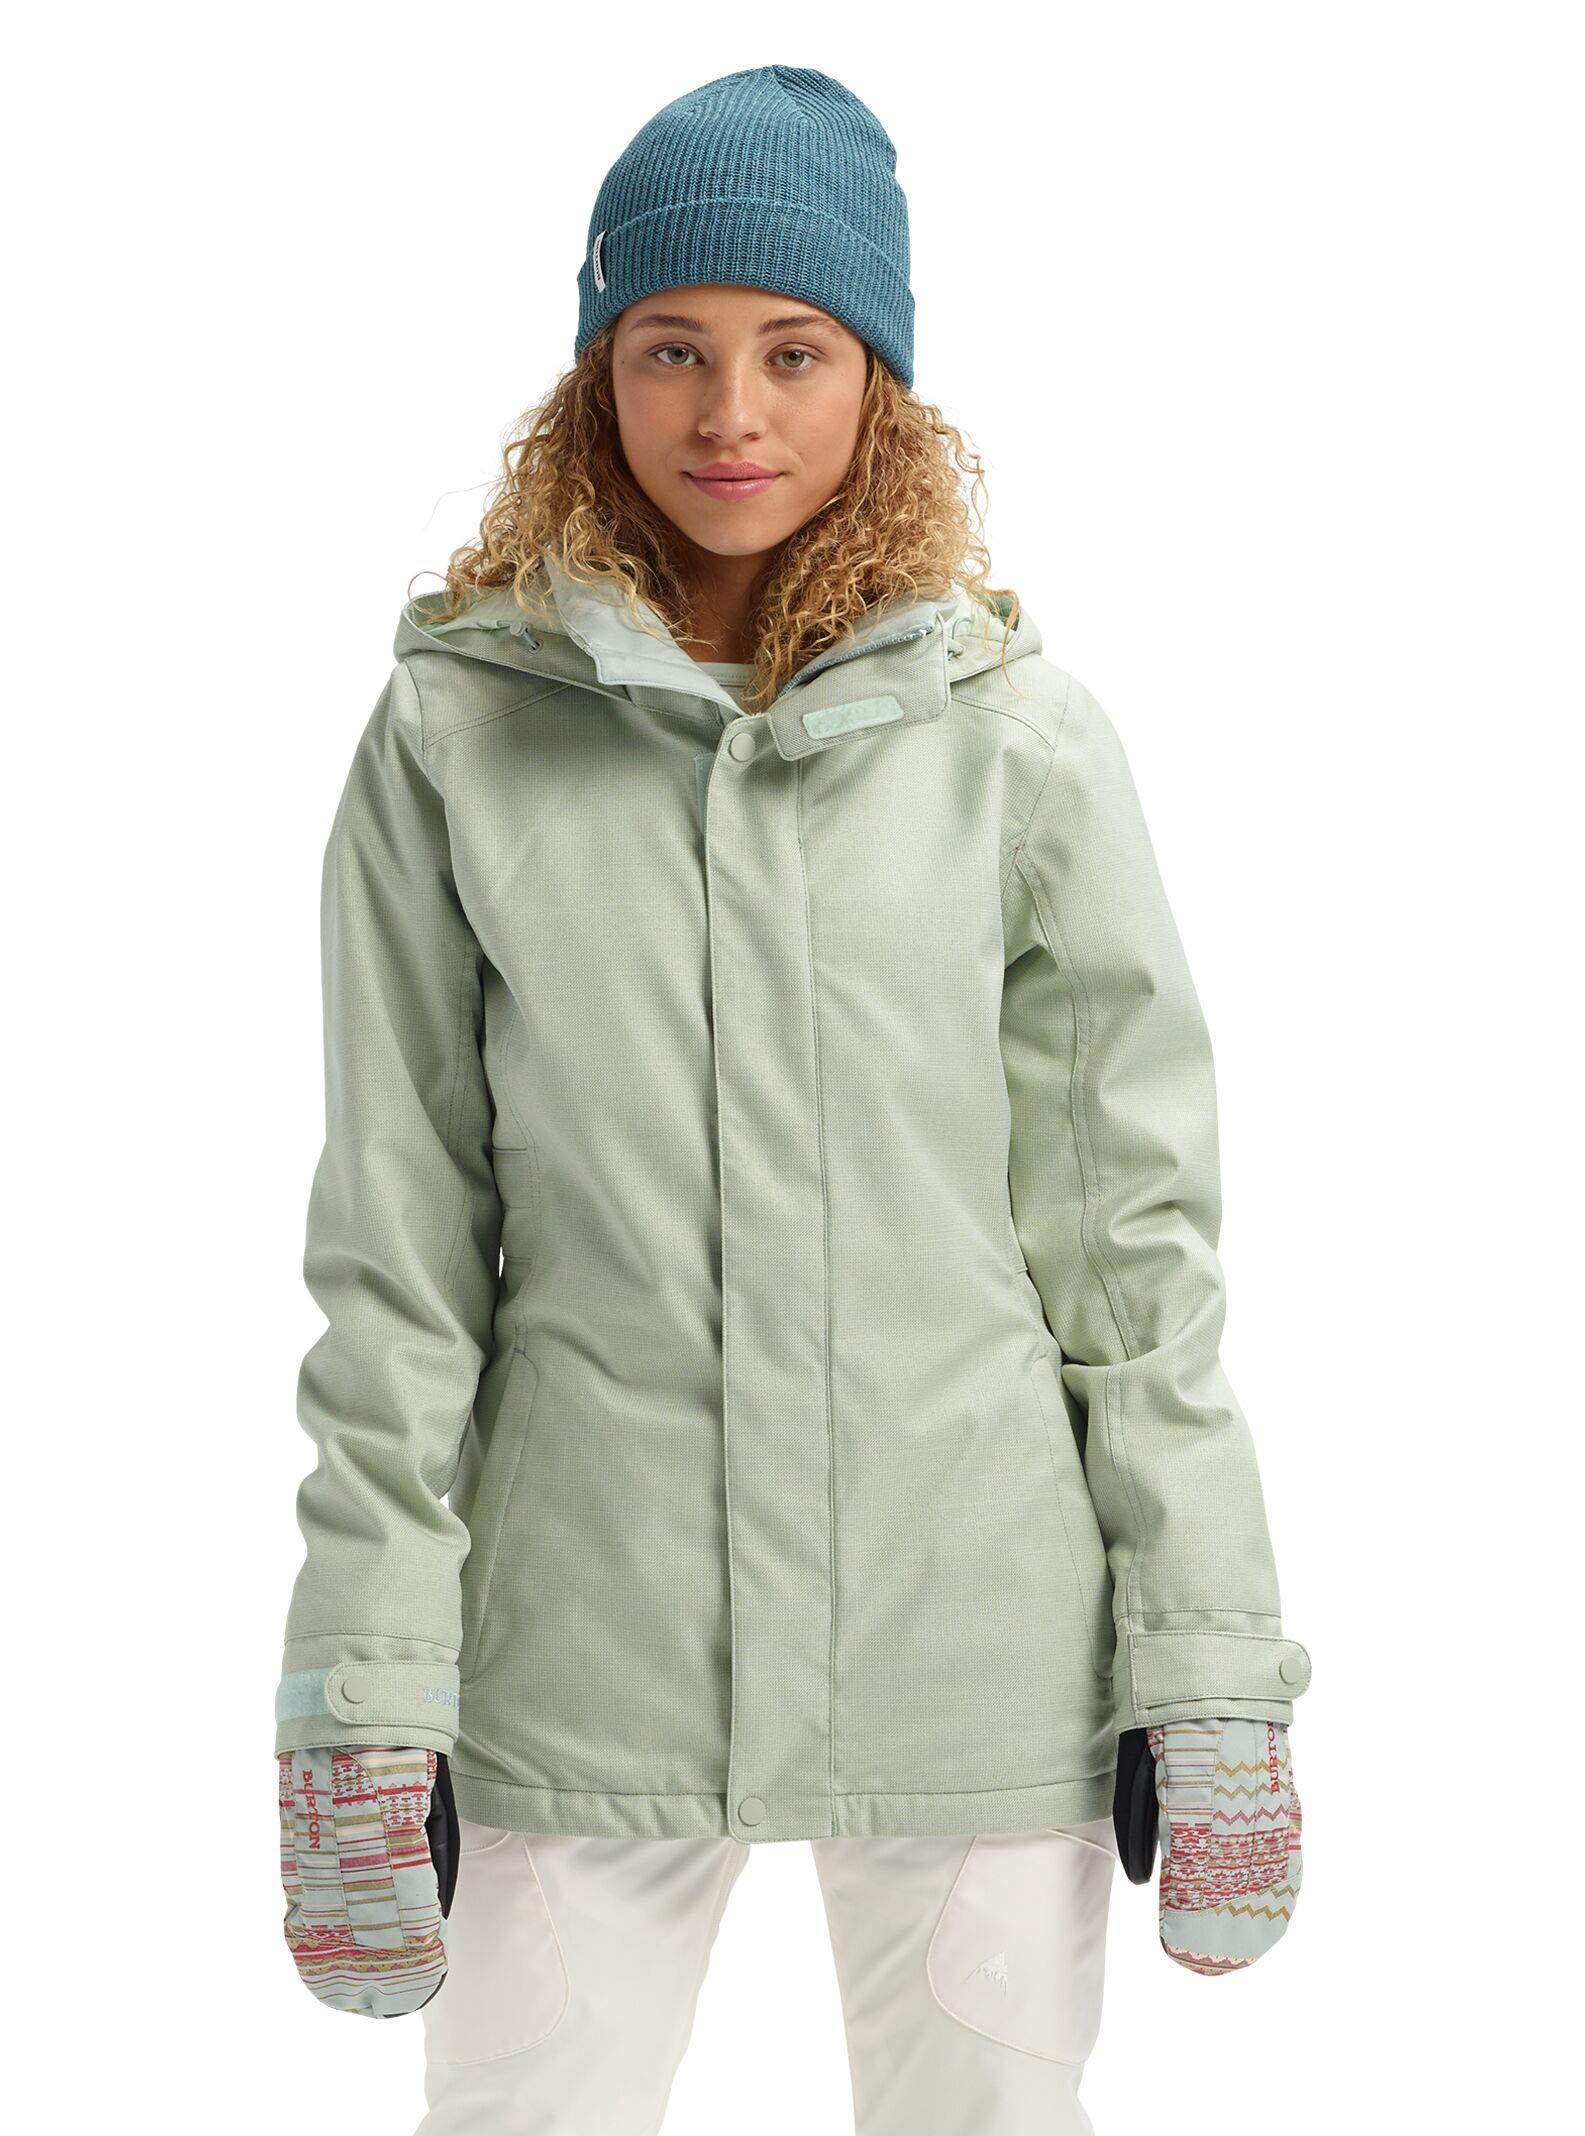 Burton Women's Jet Set Ski/Snowboard Jacket